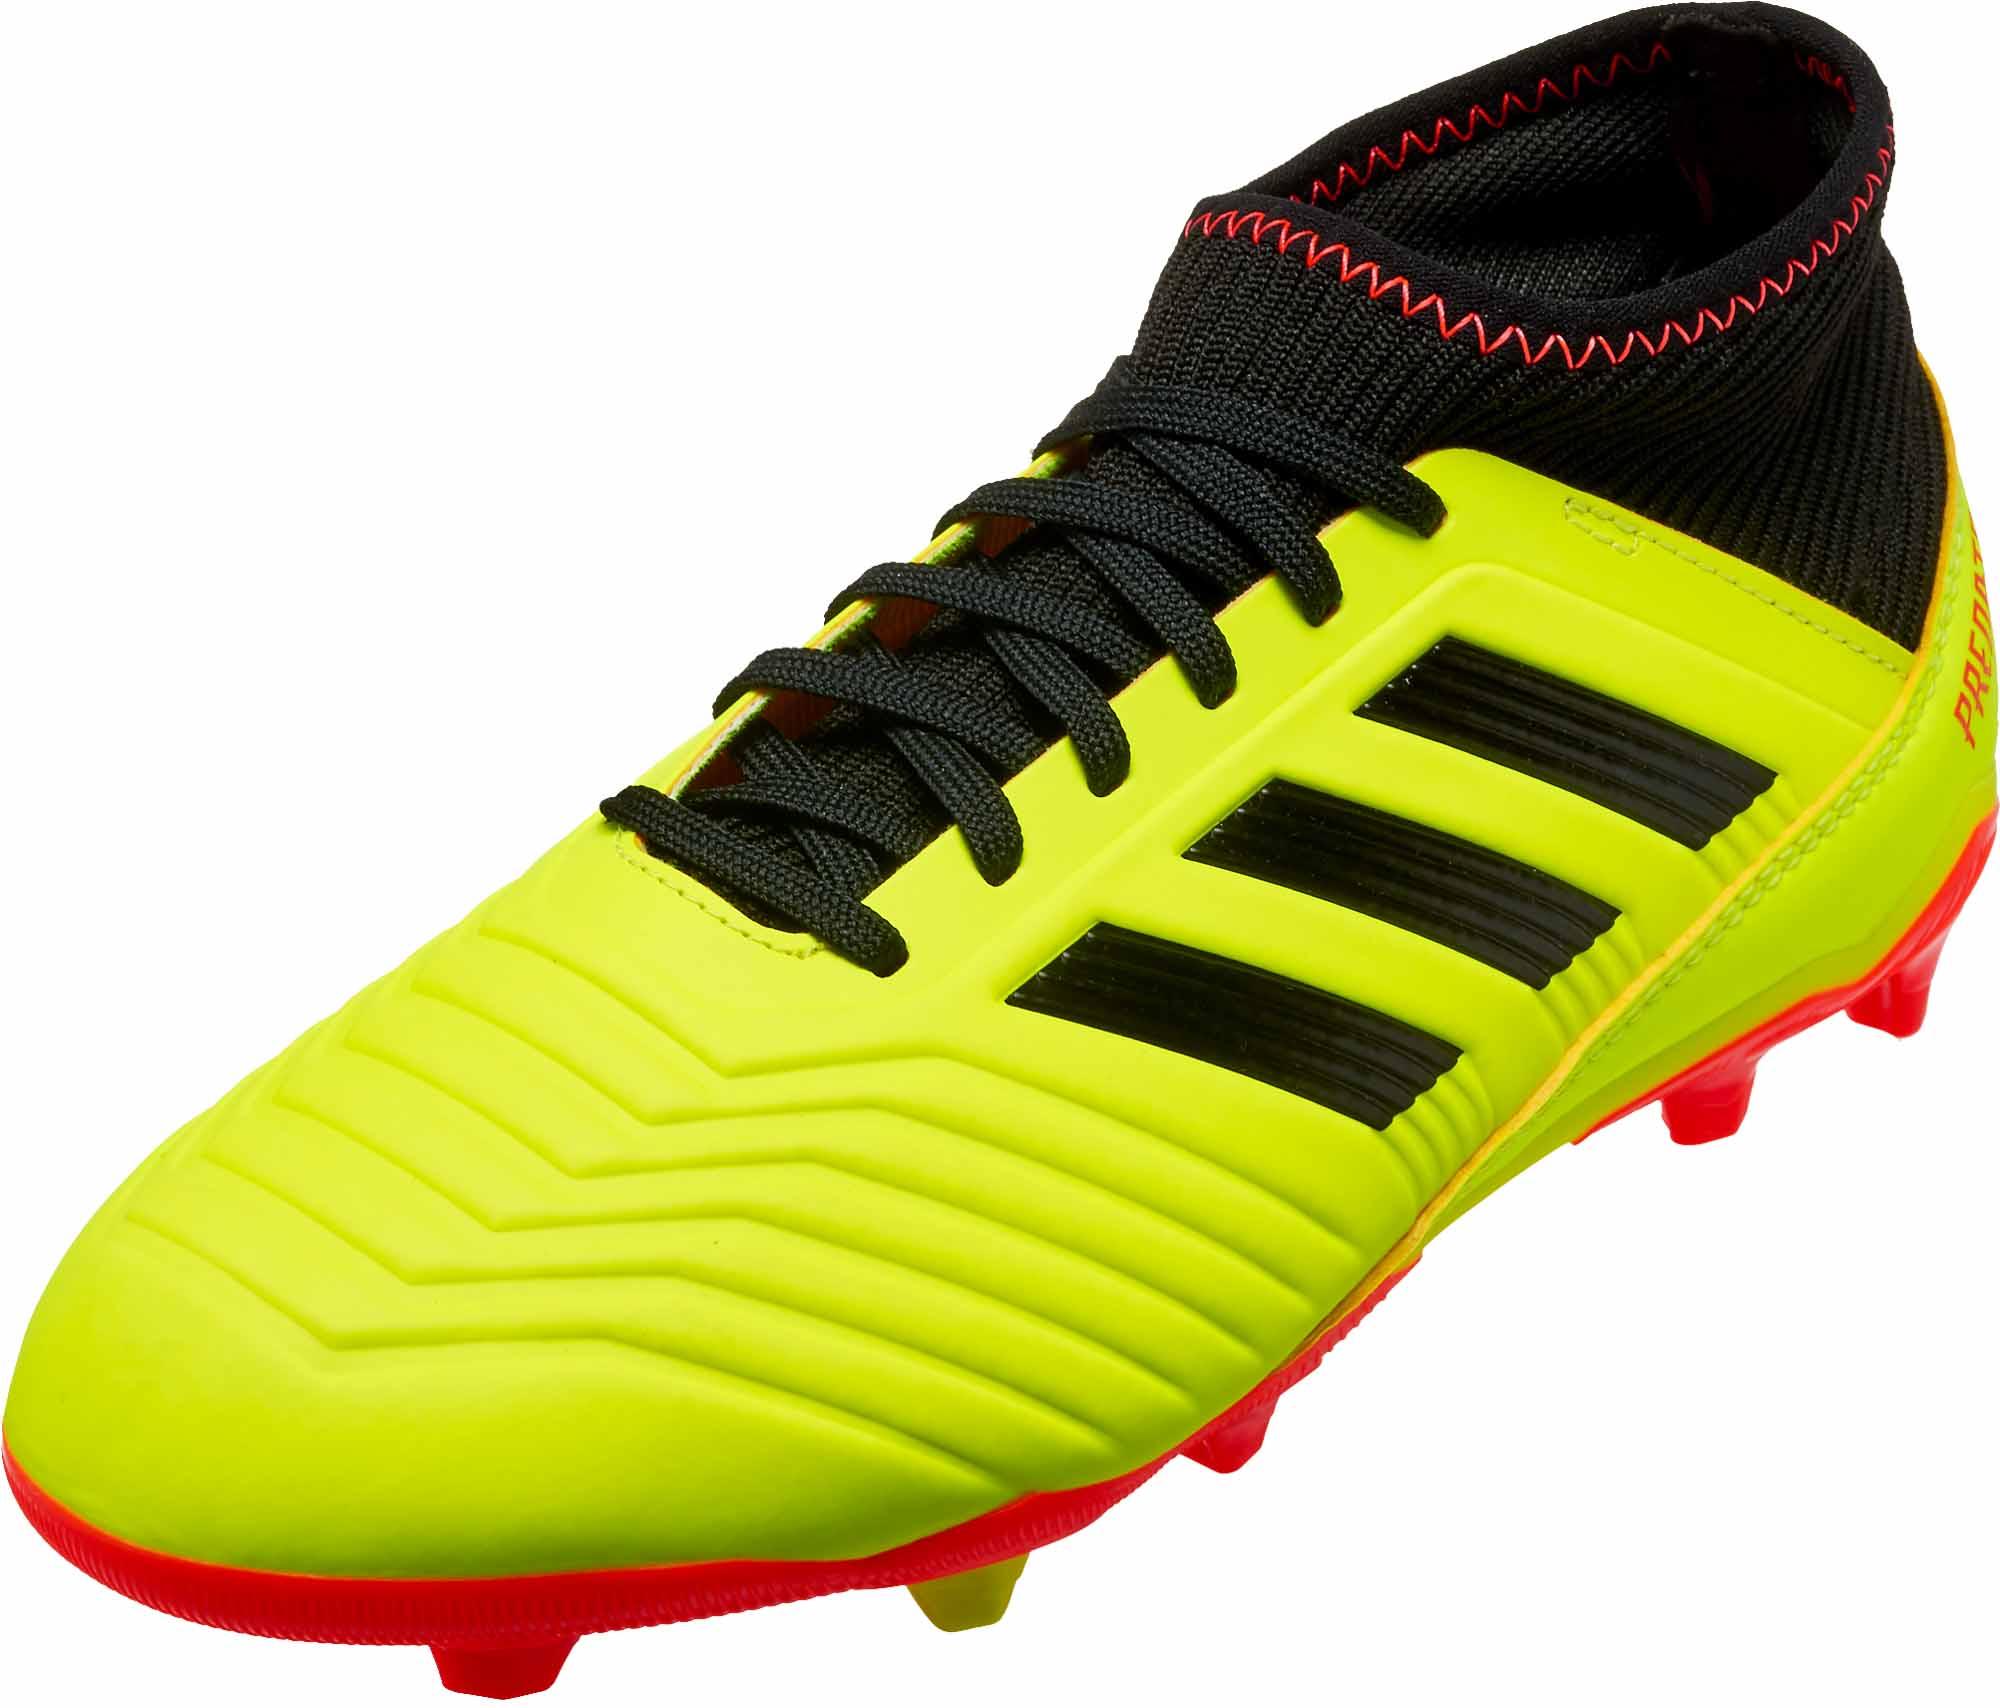 0ad9047f781ed Kids adidas Predator 18.3 FG - Energy Mode - SoccerPro